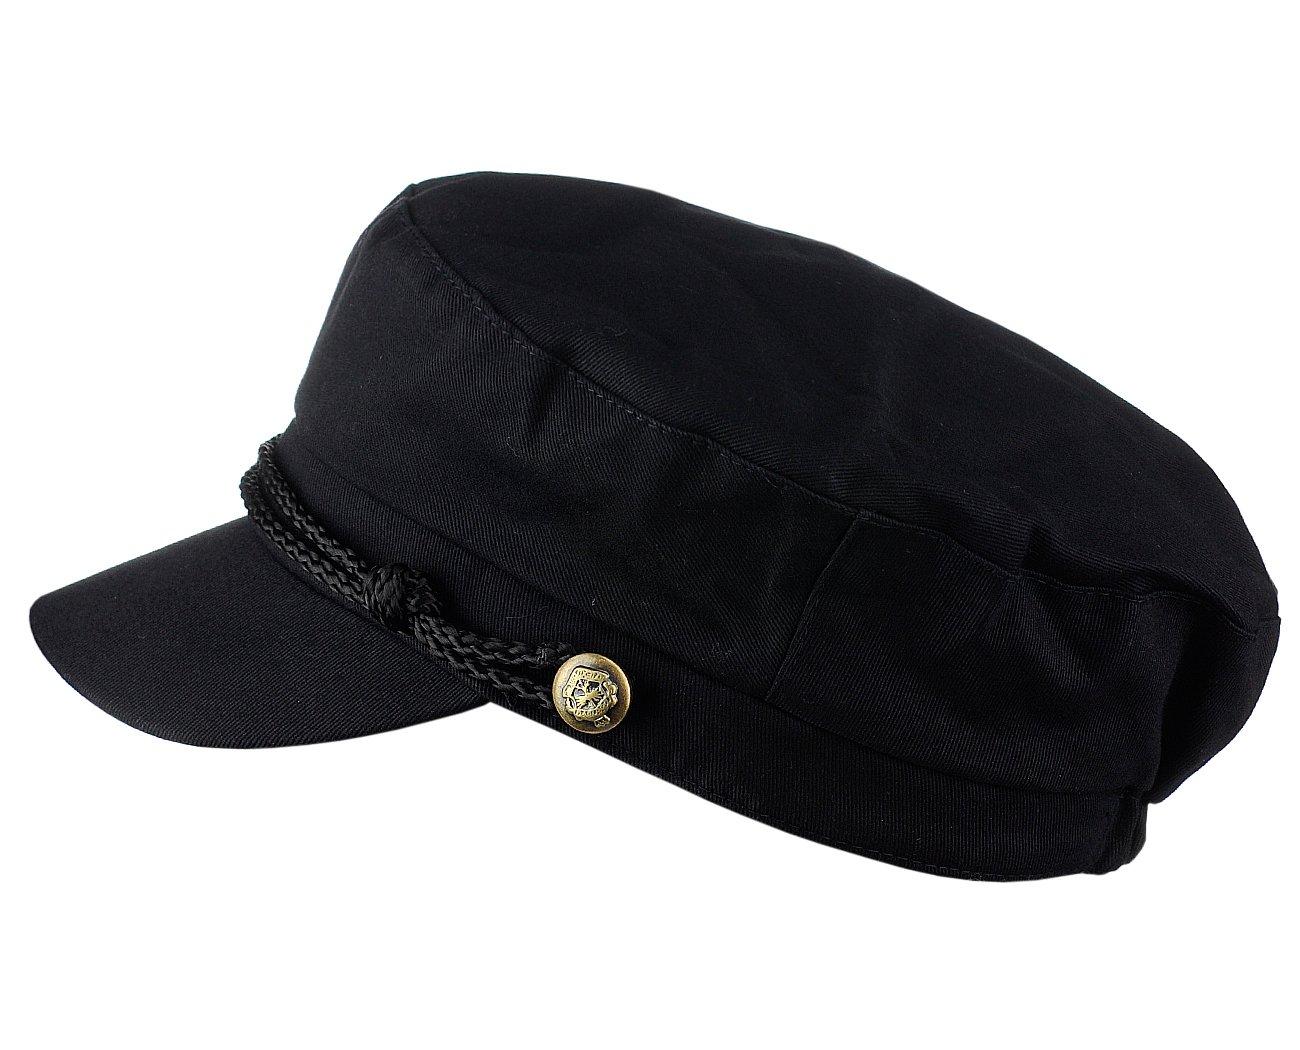 D&Y Ladies Summer Cotton Greek Fisherman Sailor Fiddler Driver Hat Flat Cap, Black by D&Y (Image #3)